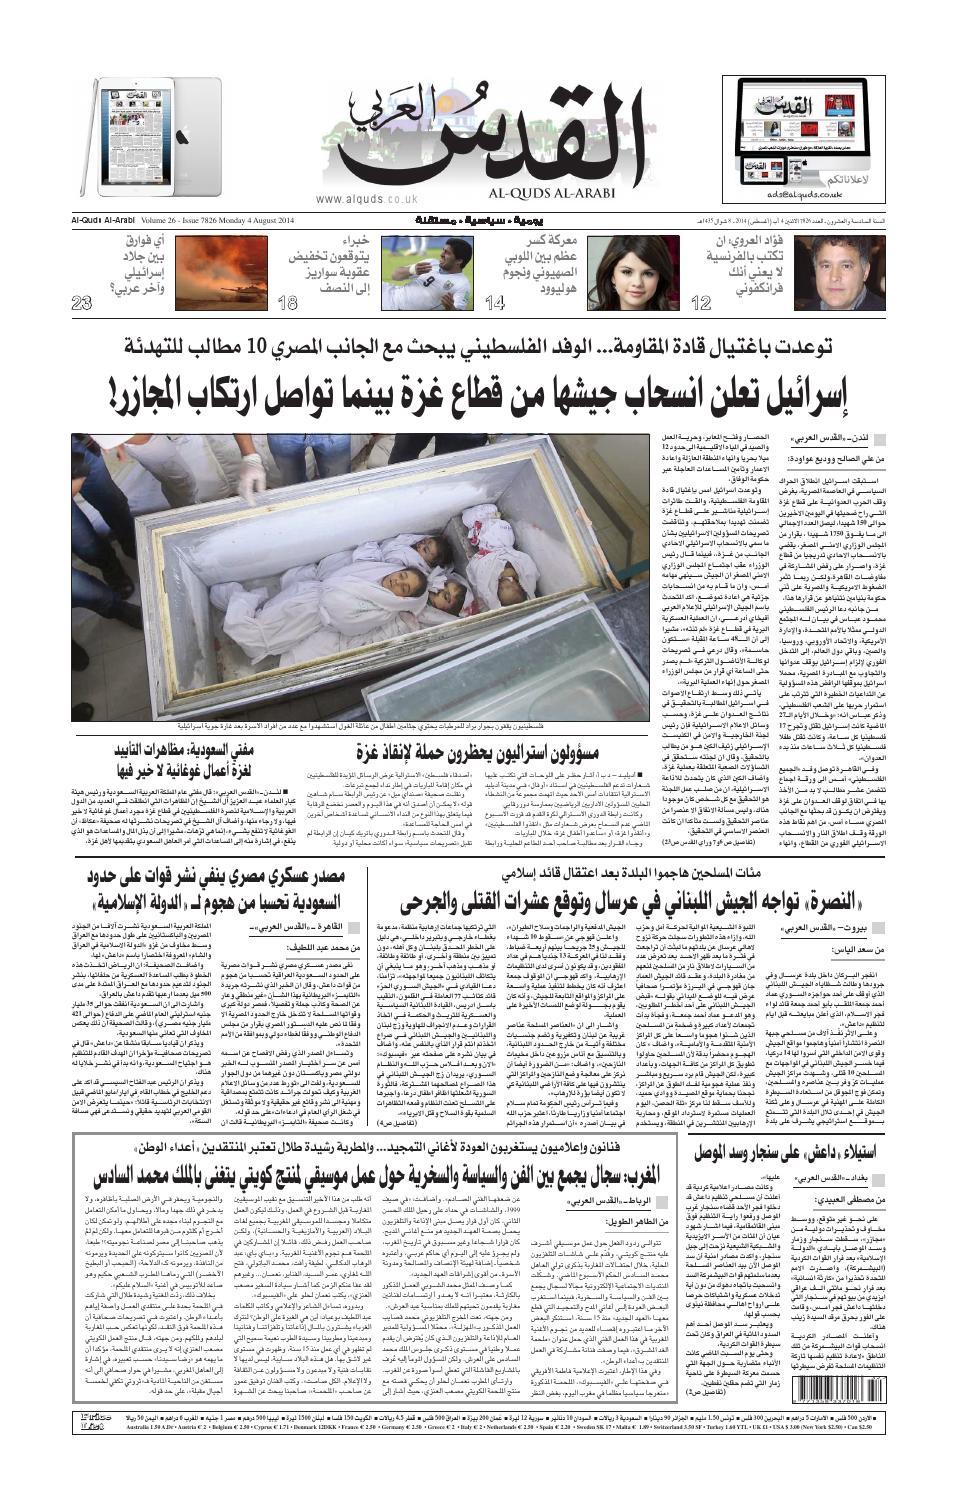 dc314fb36 صحيفة القدس العربي , الإثنين 04.08.2014 by مركز الحدث - issuu